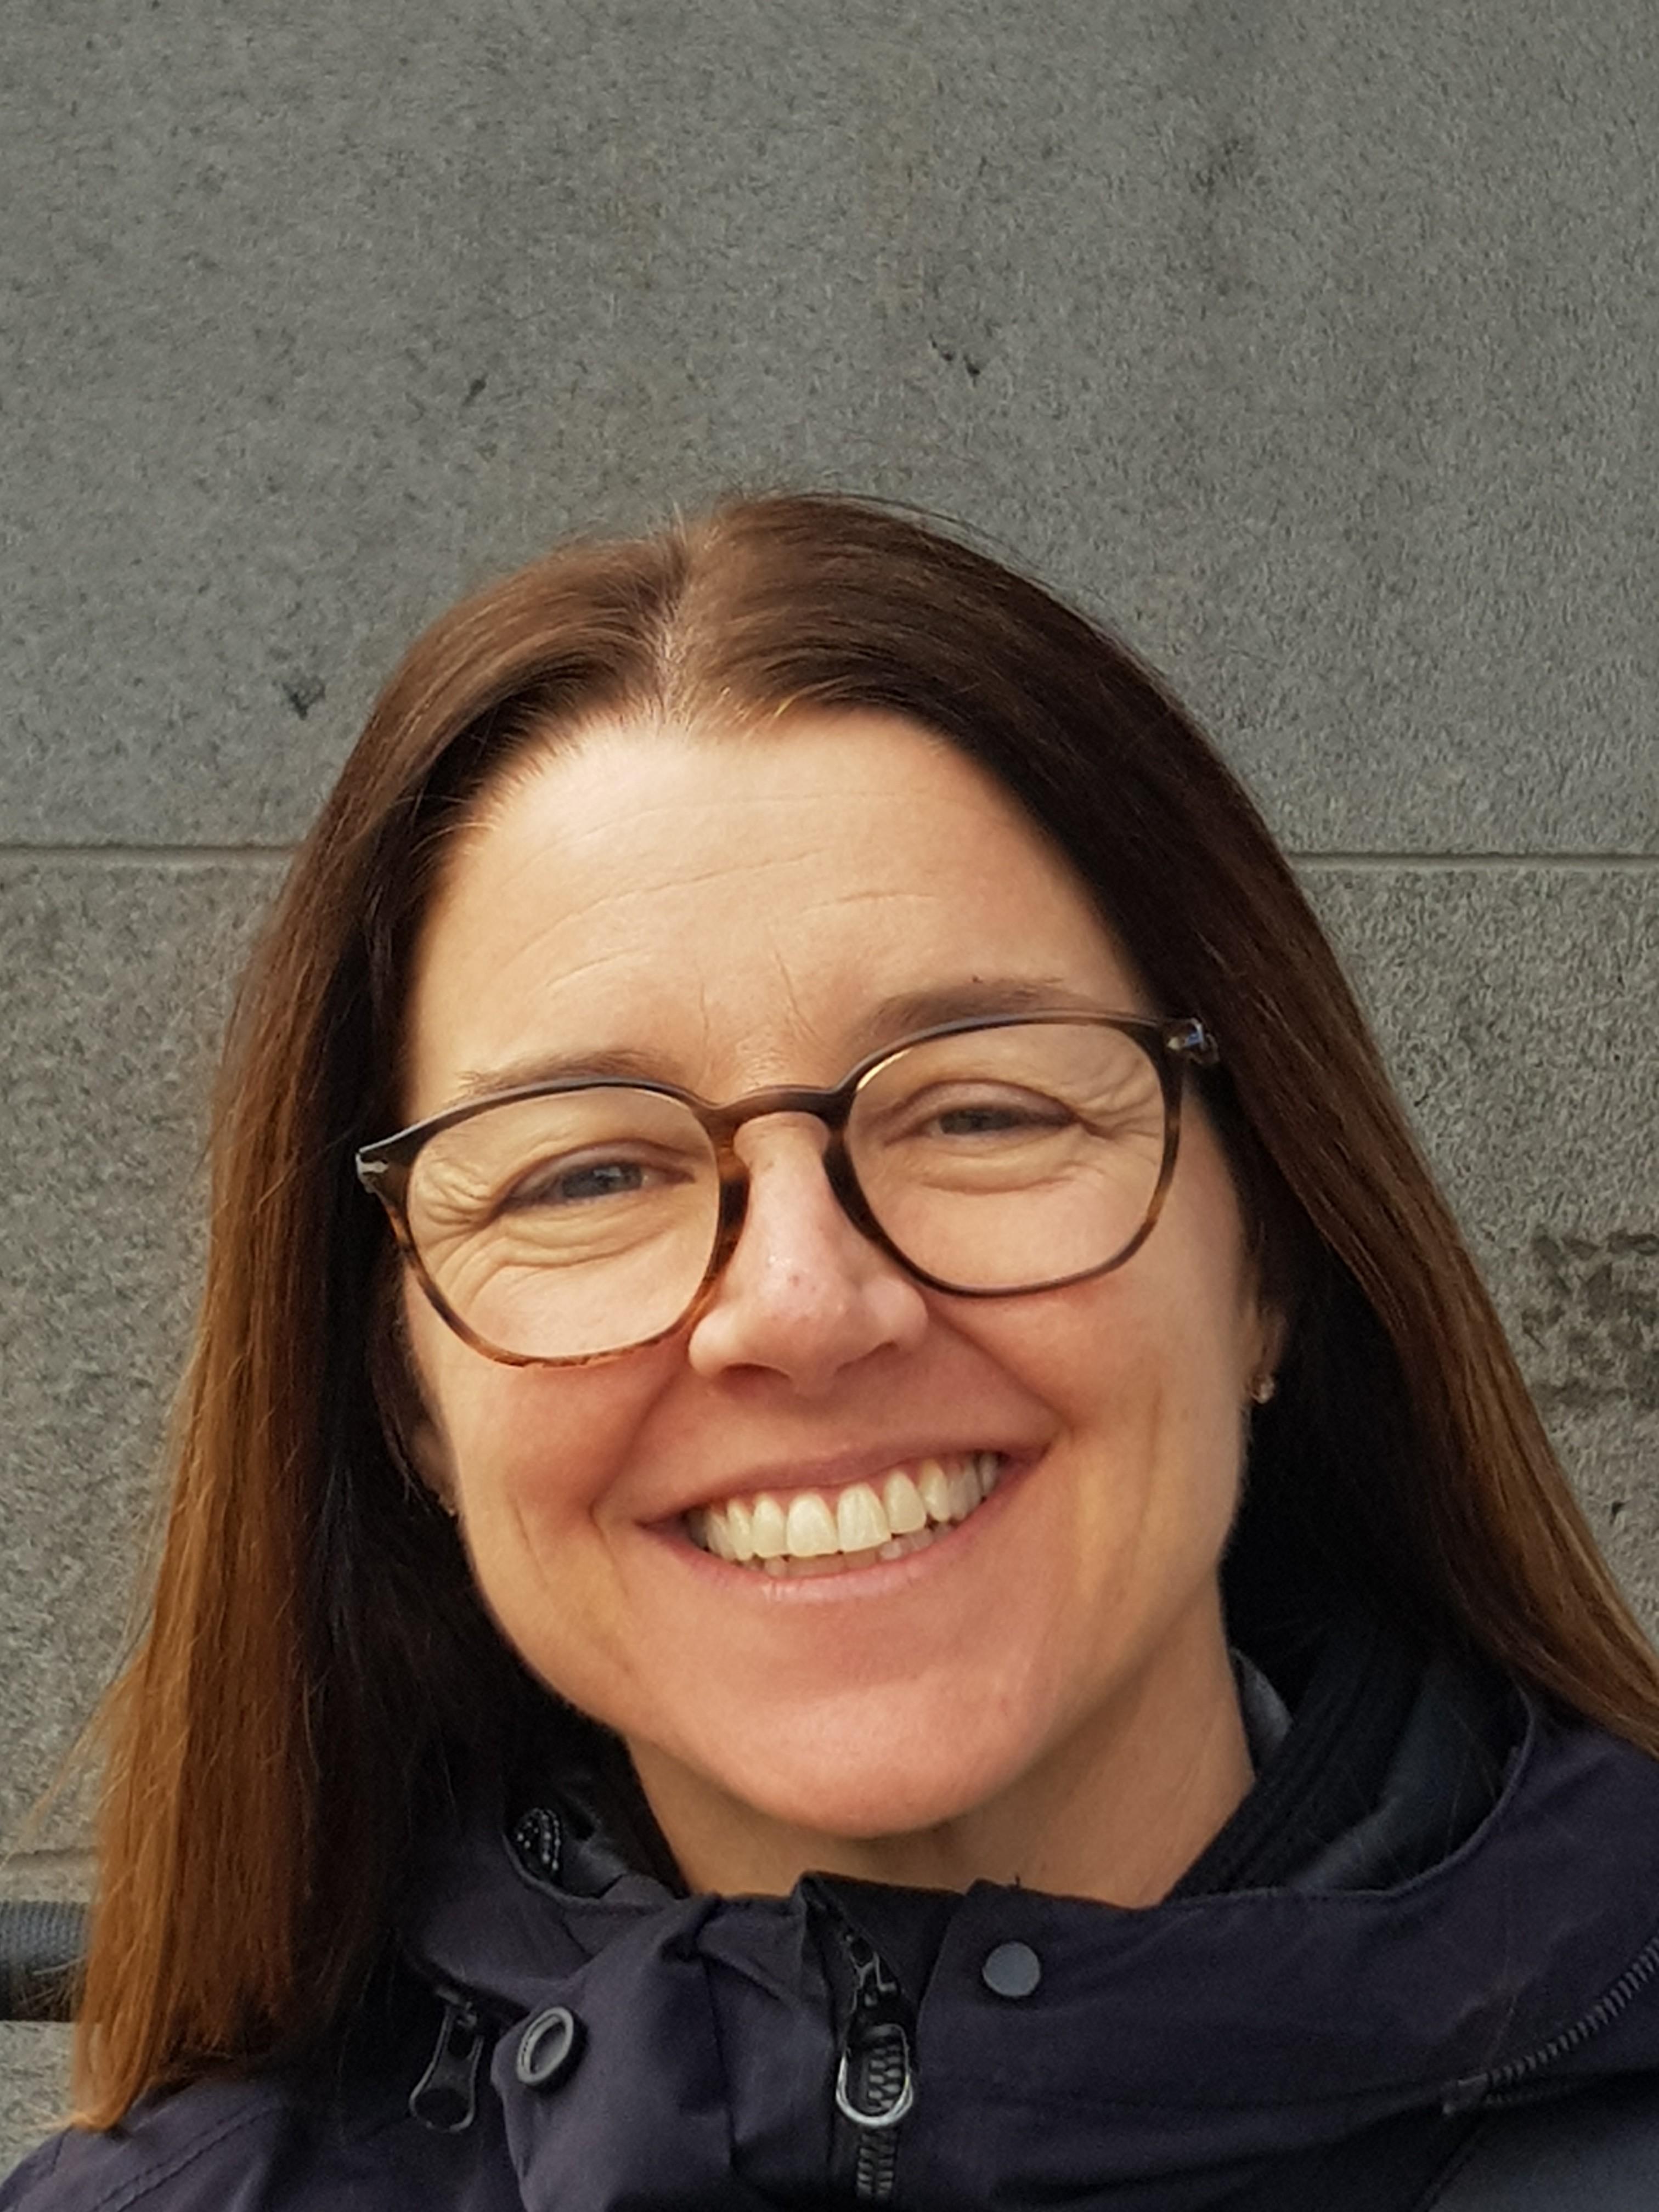 Tina Olsson